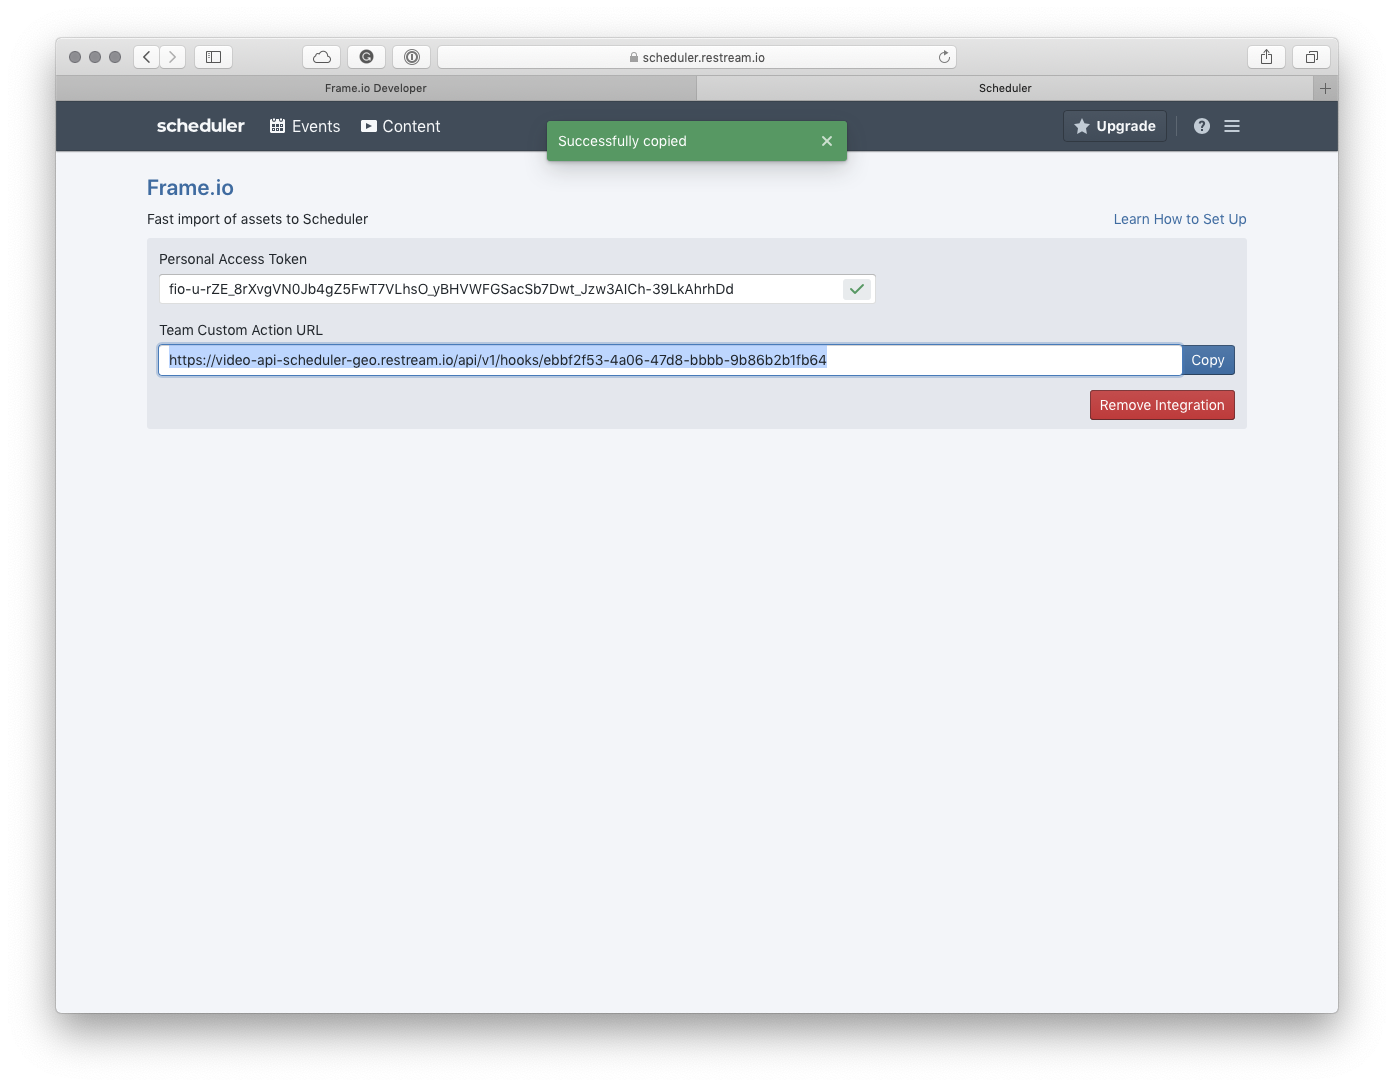 Frame.io Team Custom Action URL